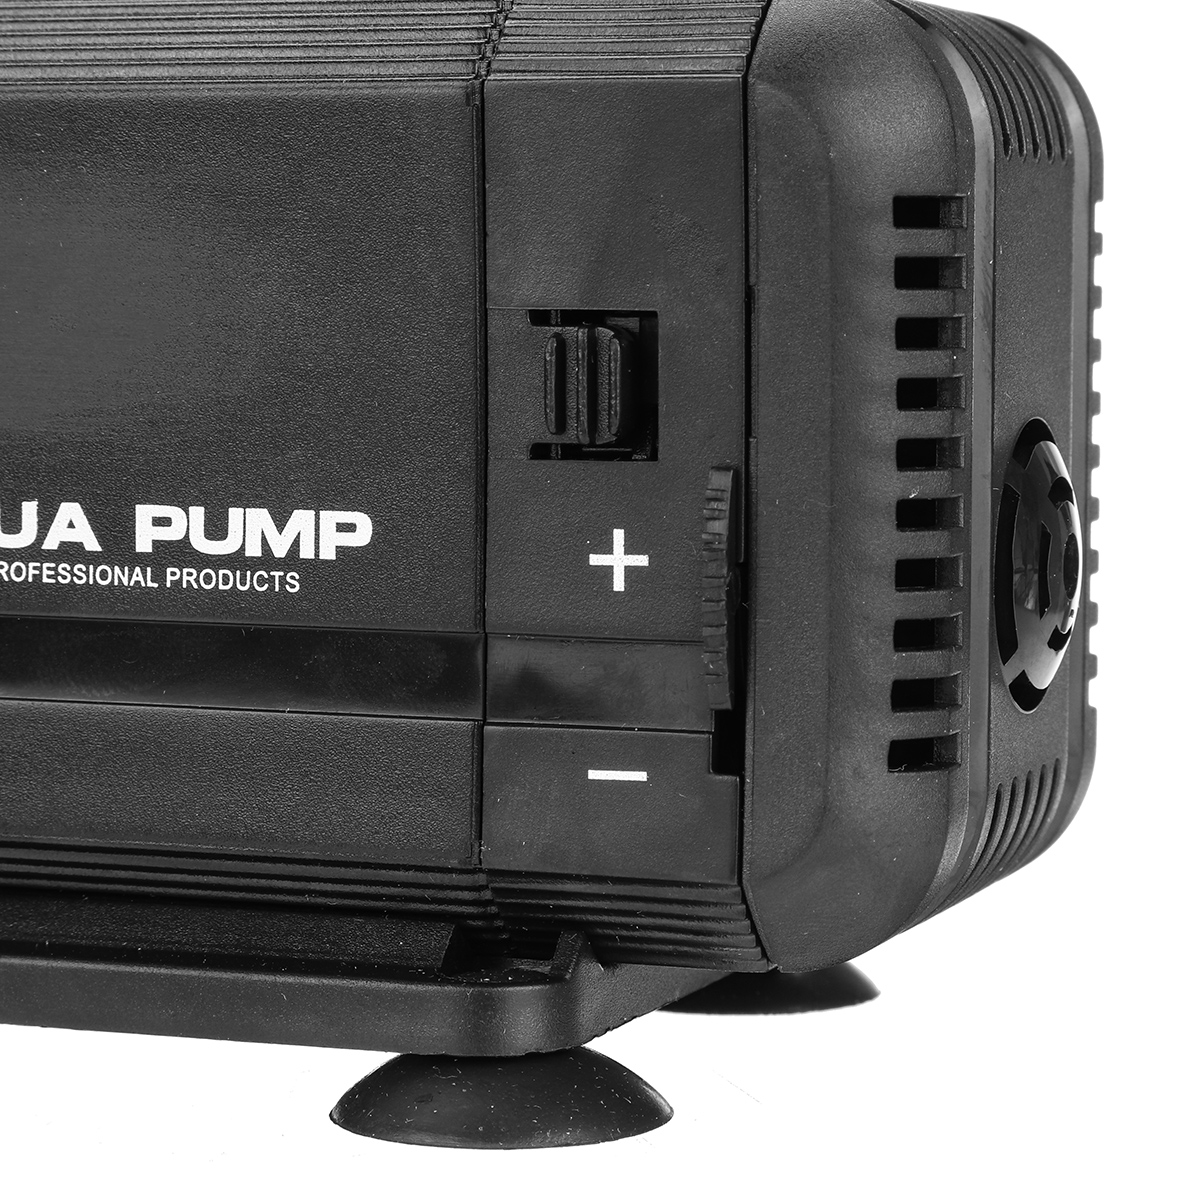 500/800/1200/1500H/L Ultra Quiet Motor Submersible Adjustable Water Pump Aquarium Fish Tank Water Pumps